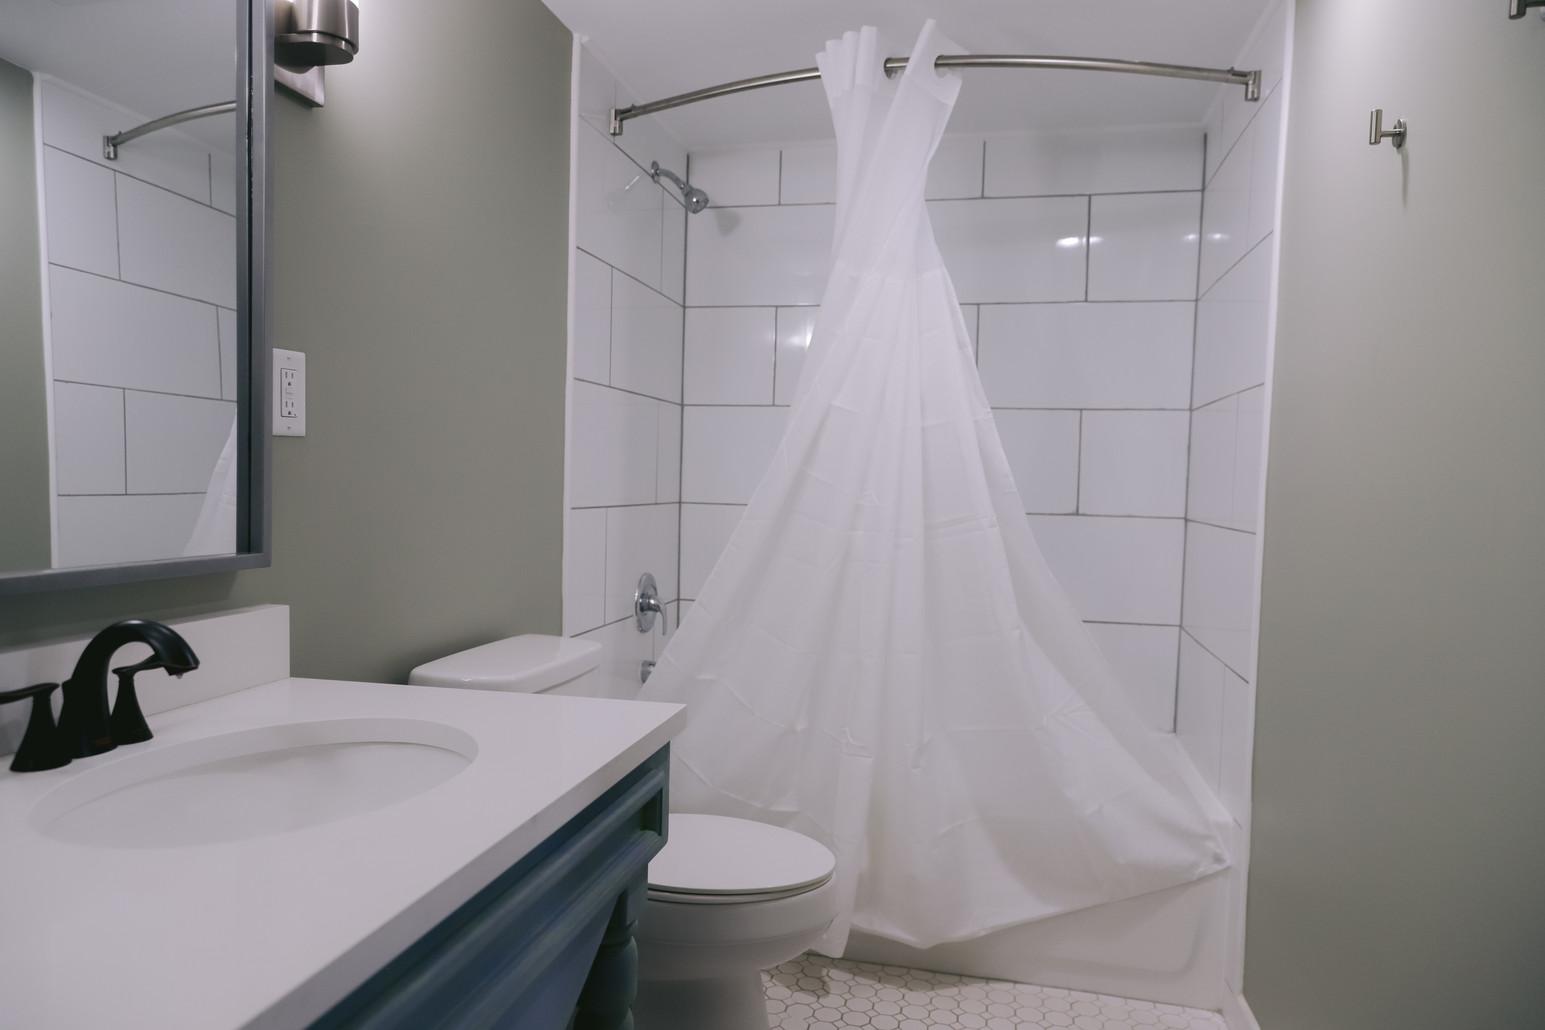 Large Tile 'Luxury' Bathrooms In Every Room